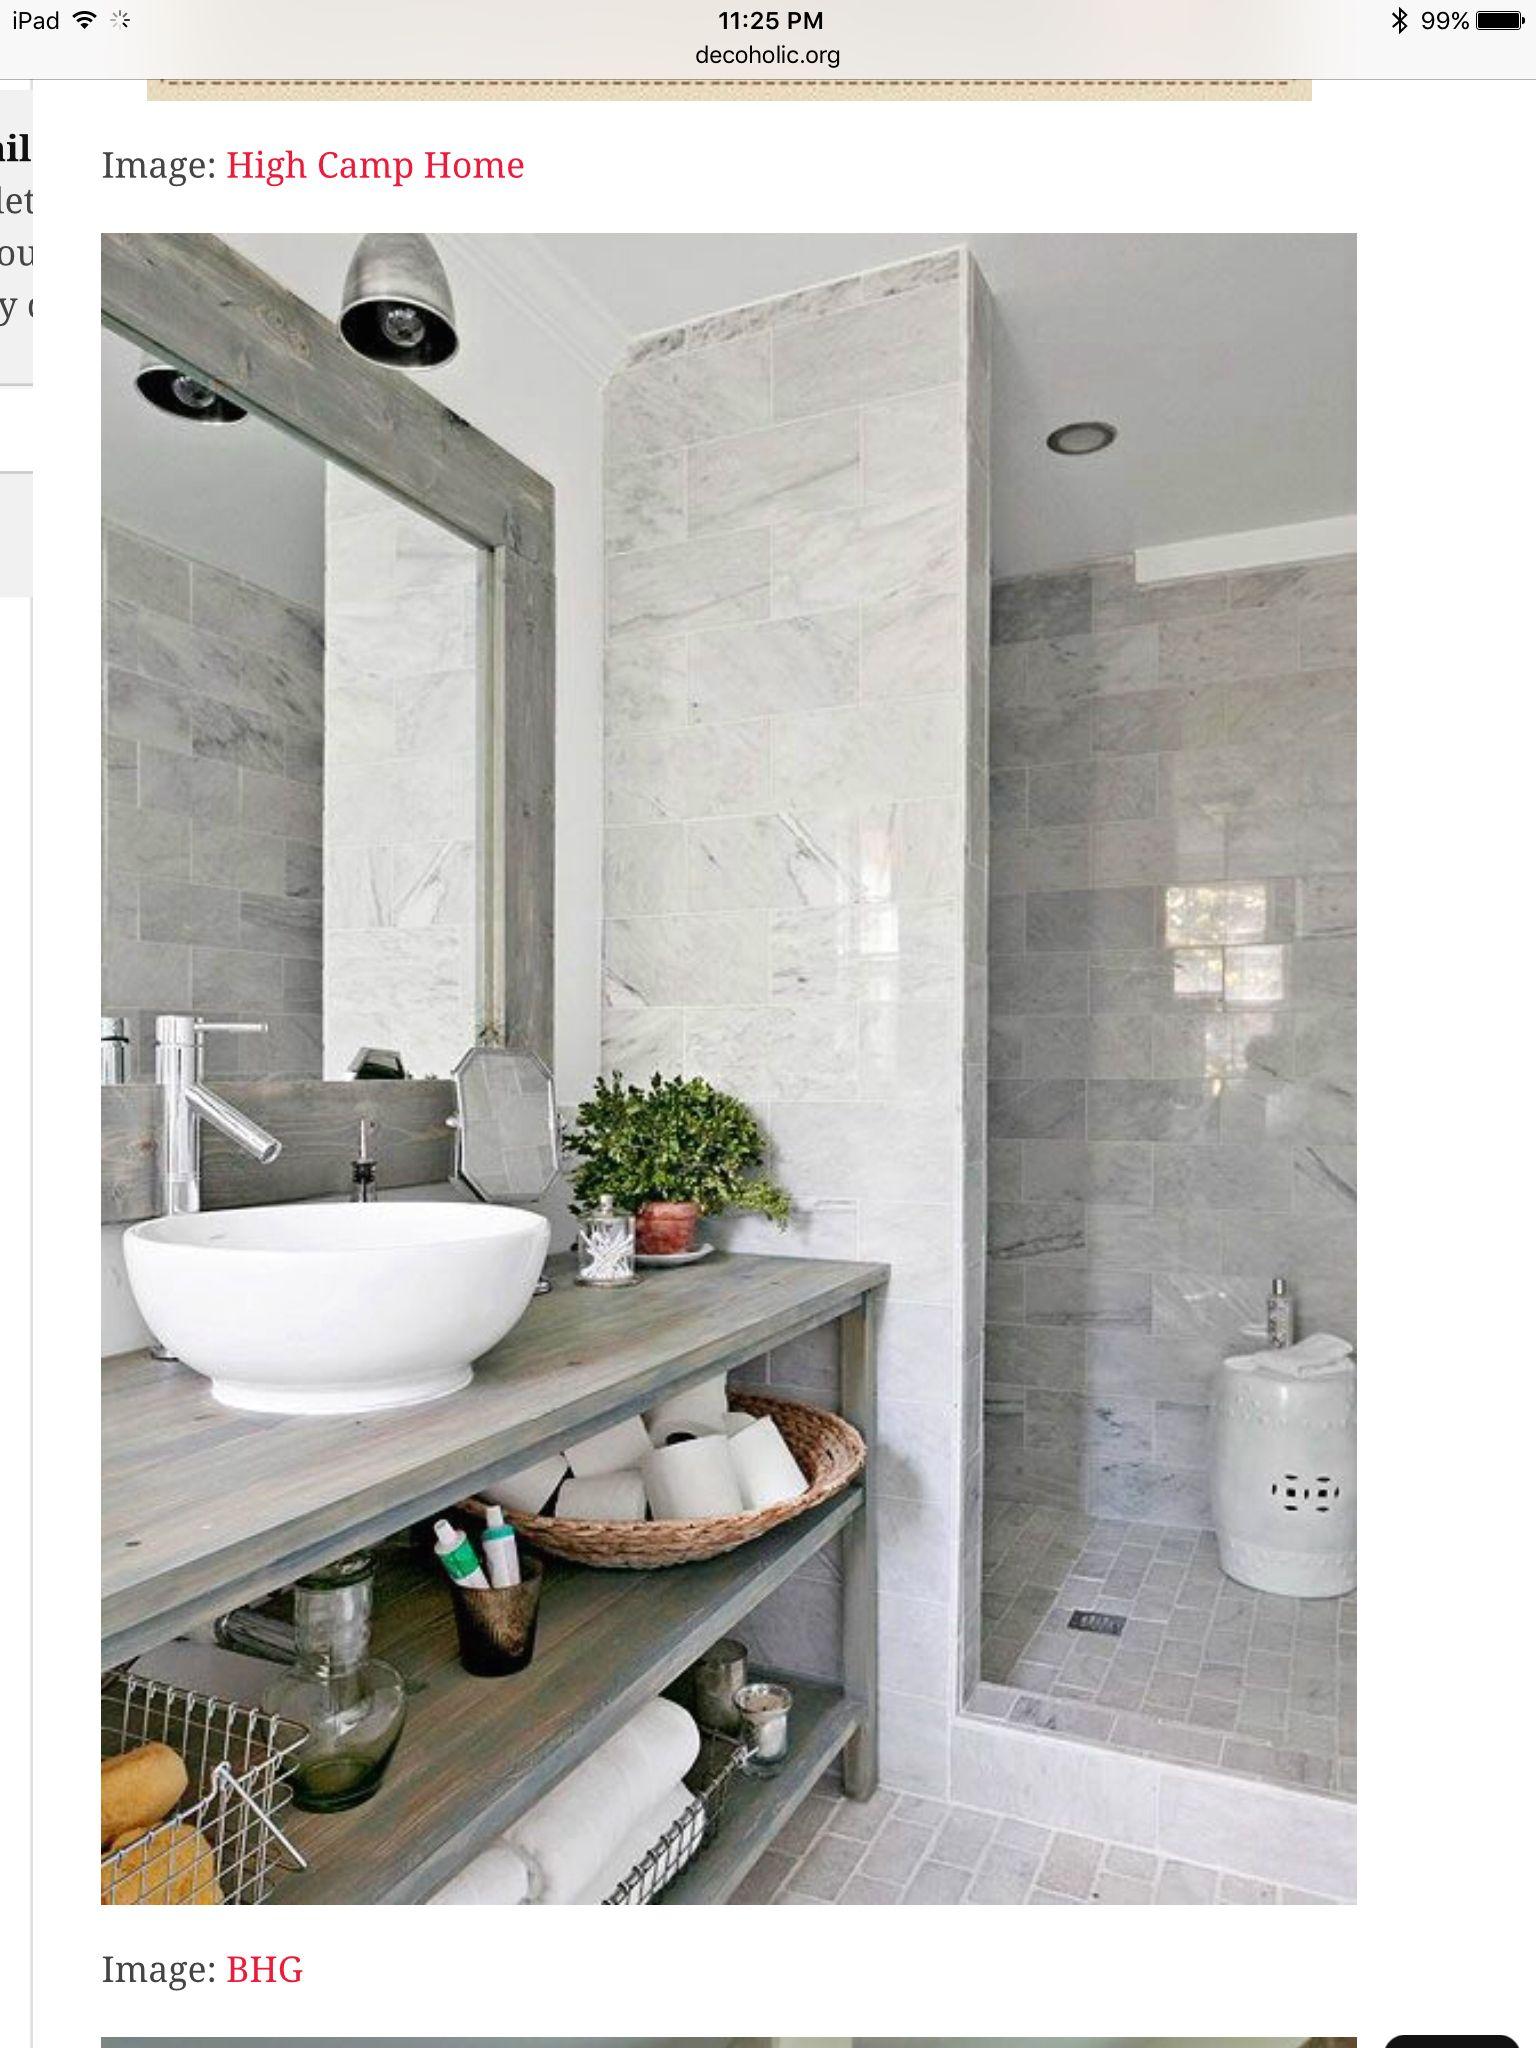 Pin by Carmel Schettino on Bathroom ideas | Pinterest